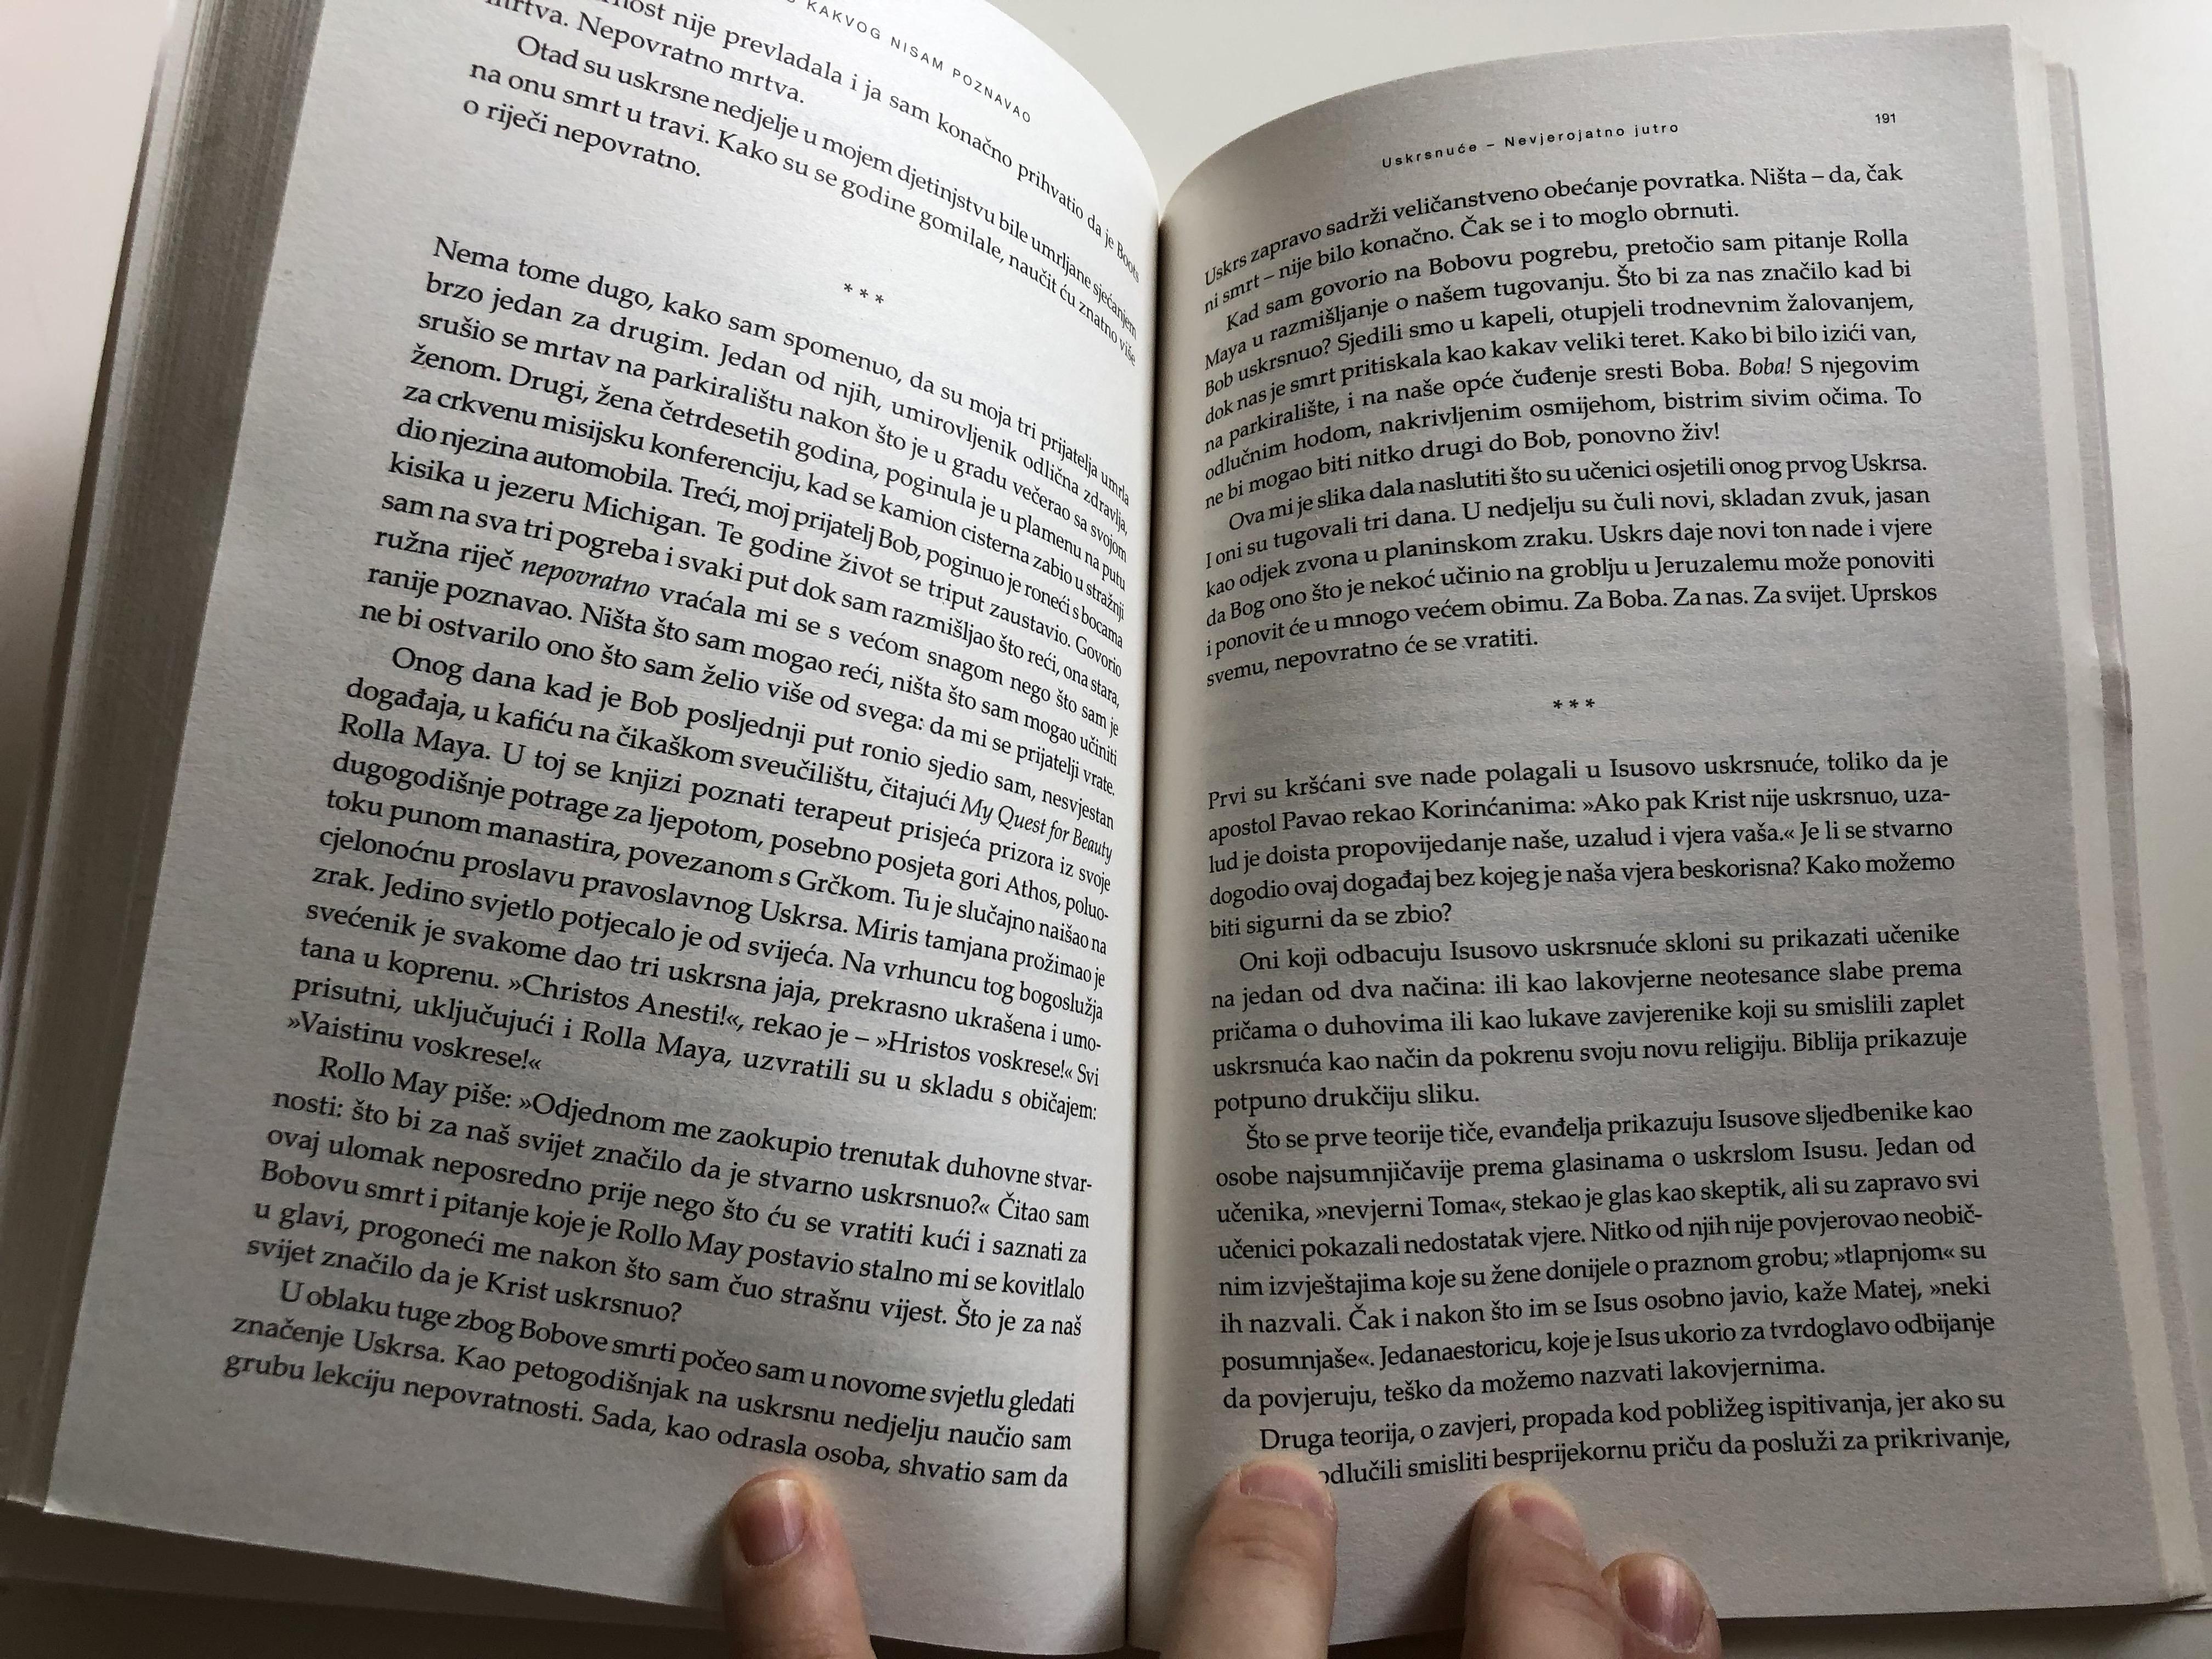 isus-kakvog-nisam-poznavao-by-philip-yancey-croatian-language-edition-8.jpg